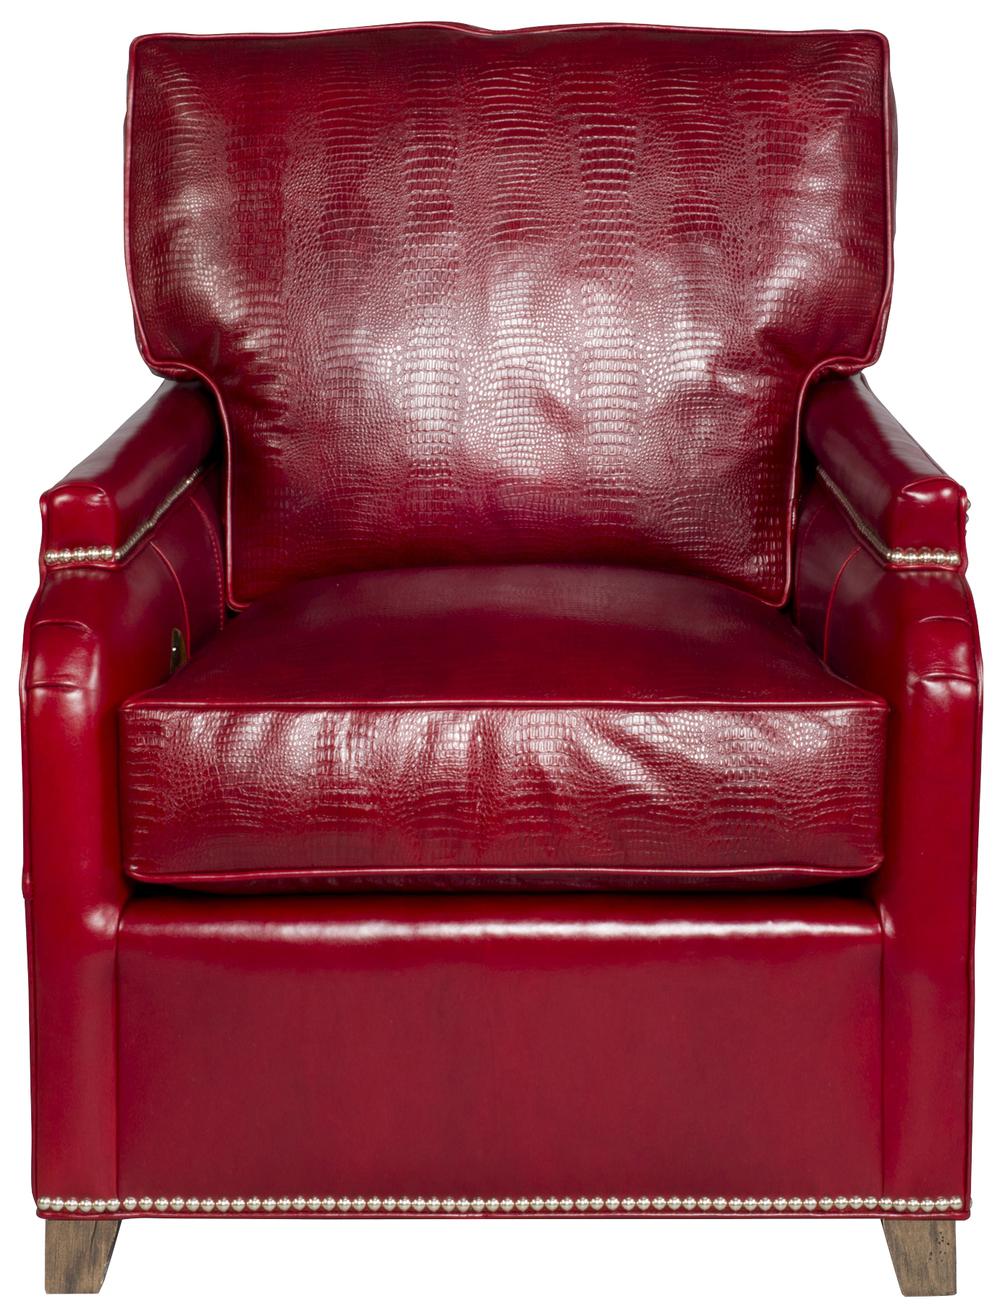 Vanguard Furniture - Ginger Tilt Back Chair